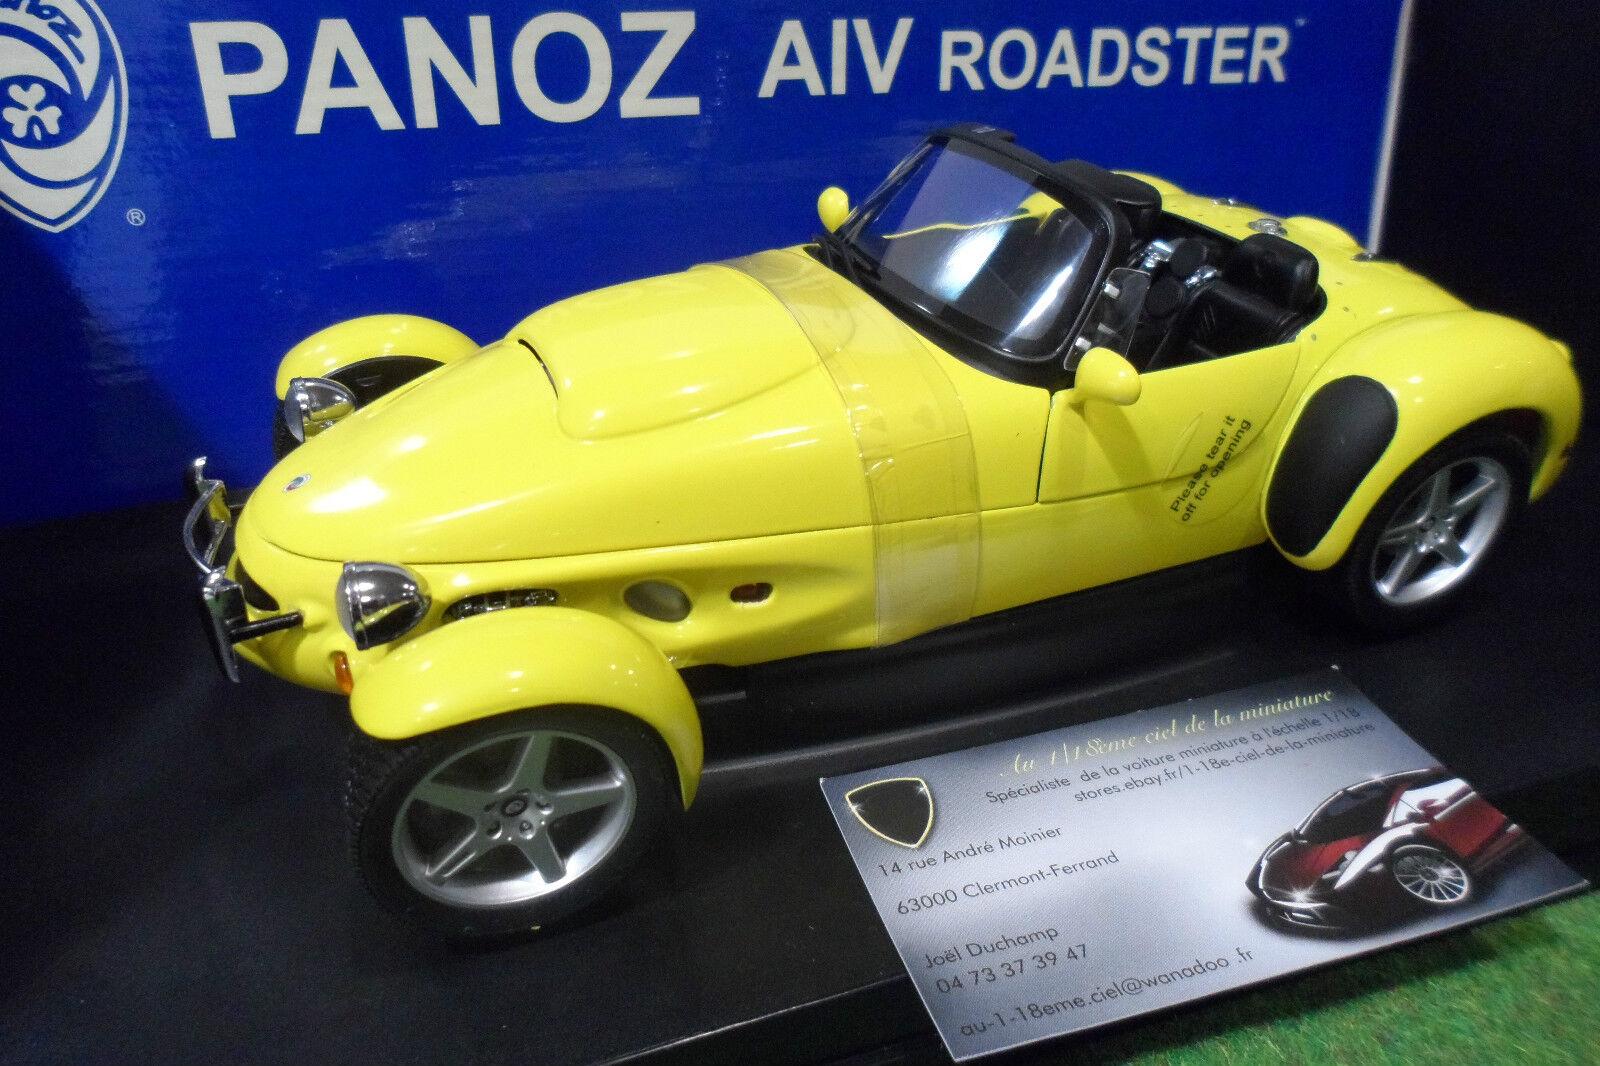 PANOZ AIV ROADSTER 1998 cabriolet jaune jaune 1 18 AUTOart 78213 voit miniature